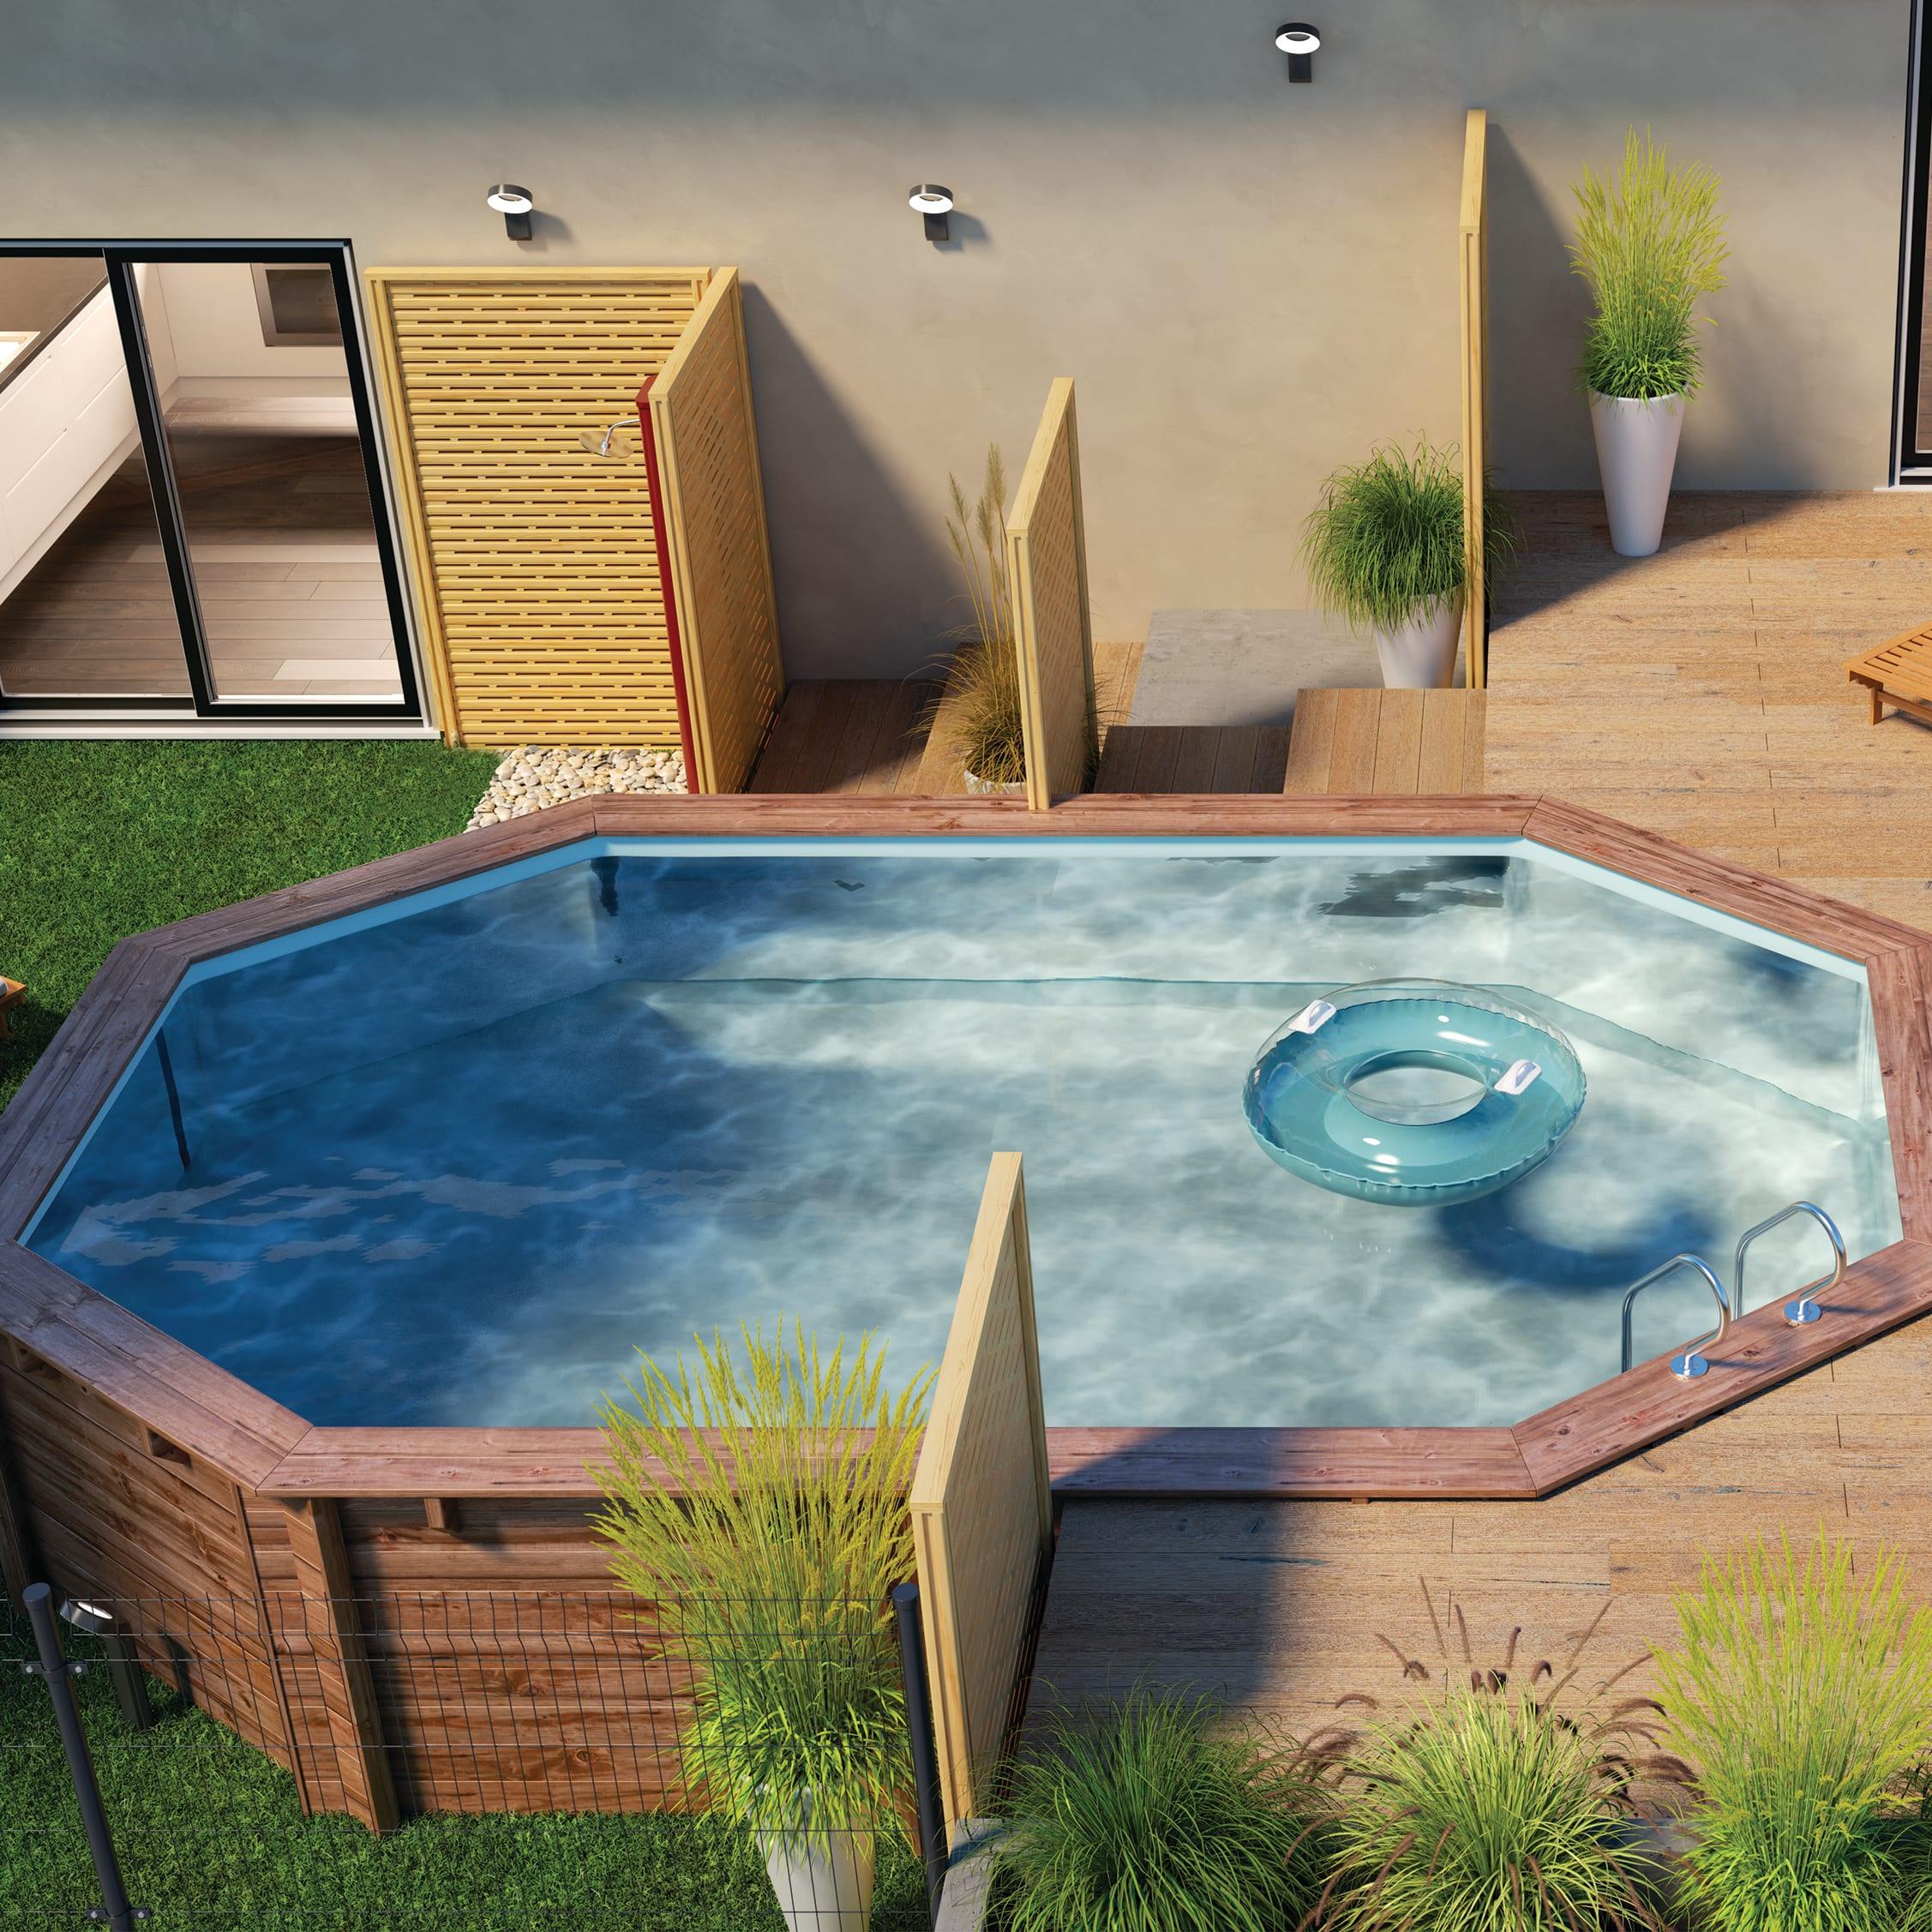 Finestra Oblò Leroy Merlin piscina fuori terra ovale autoportante gre 790087 303 x 503 cm